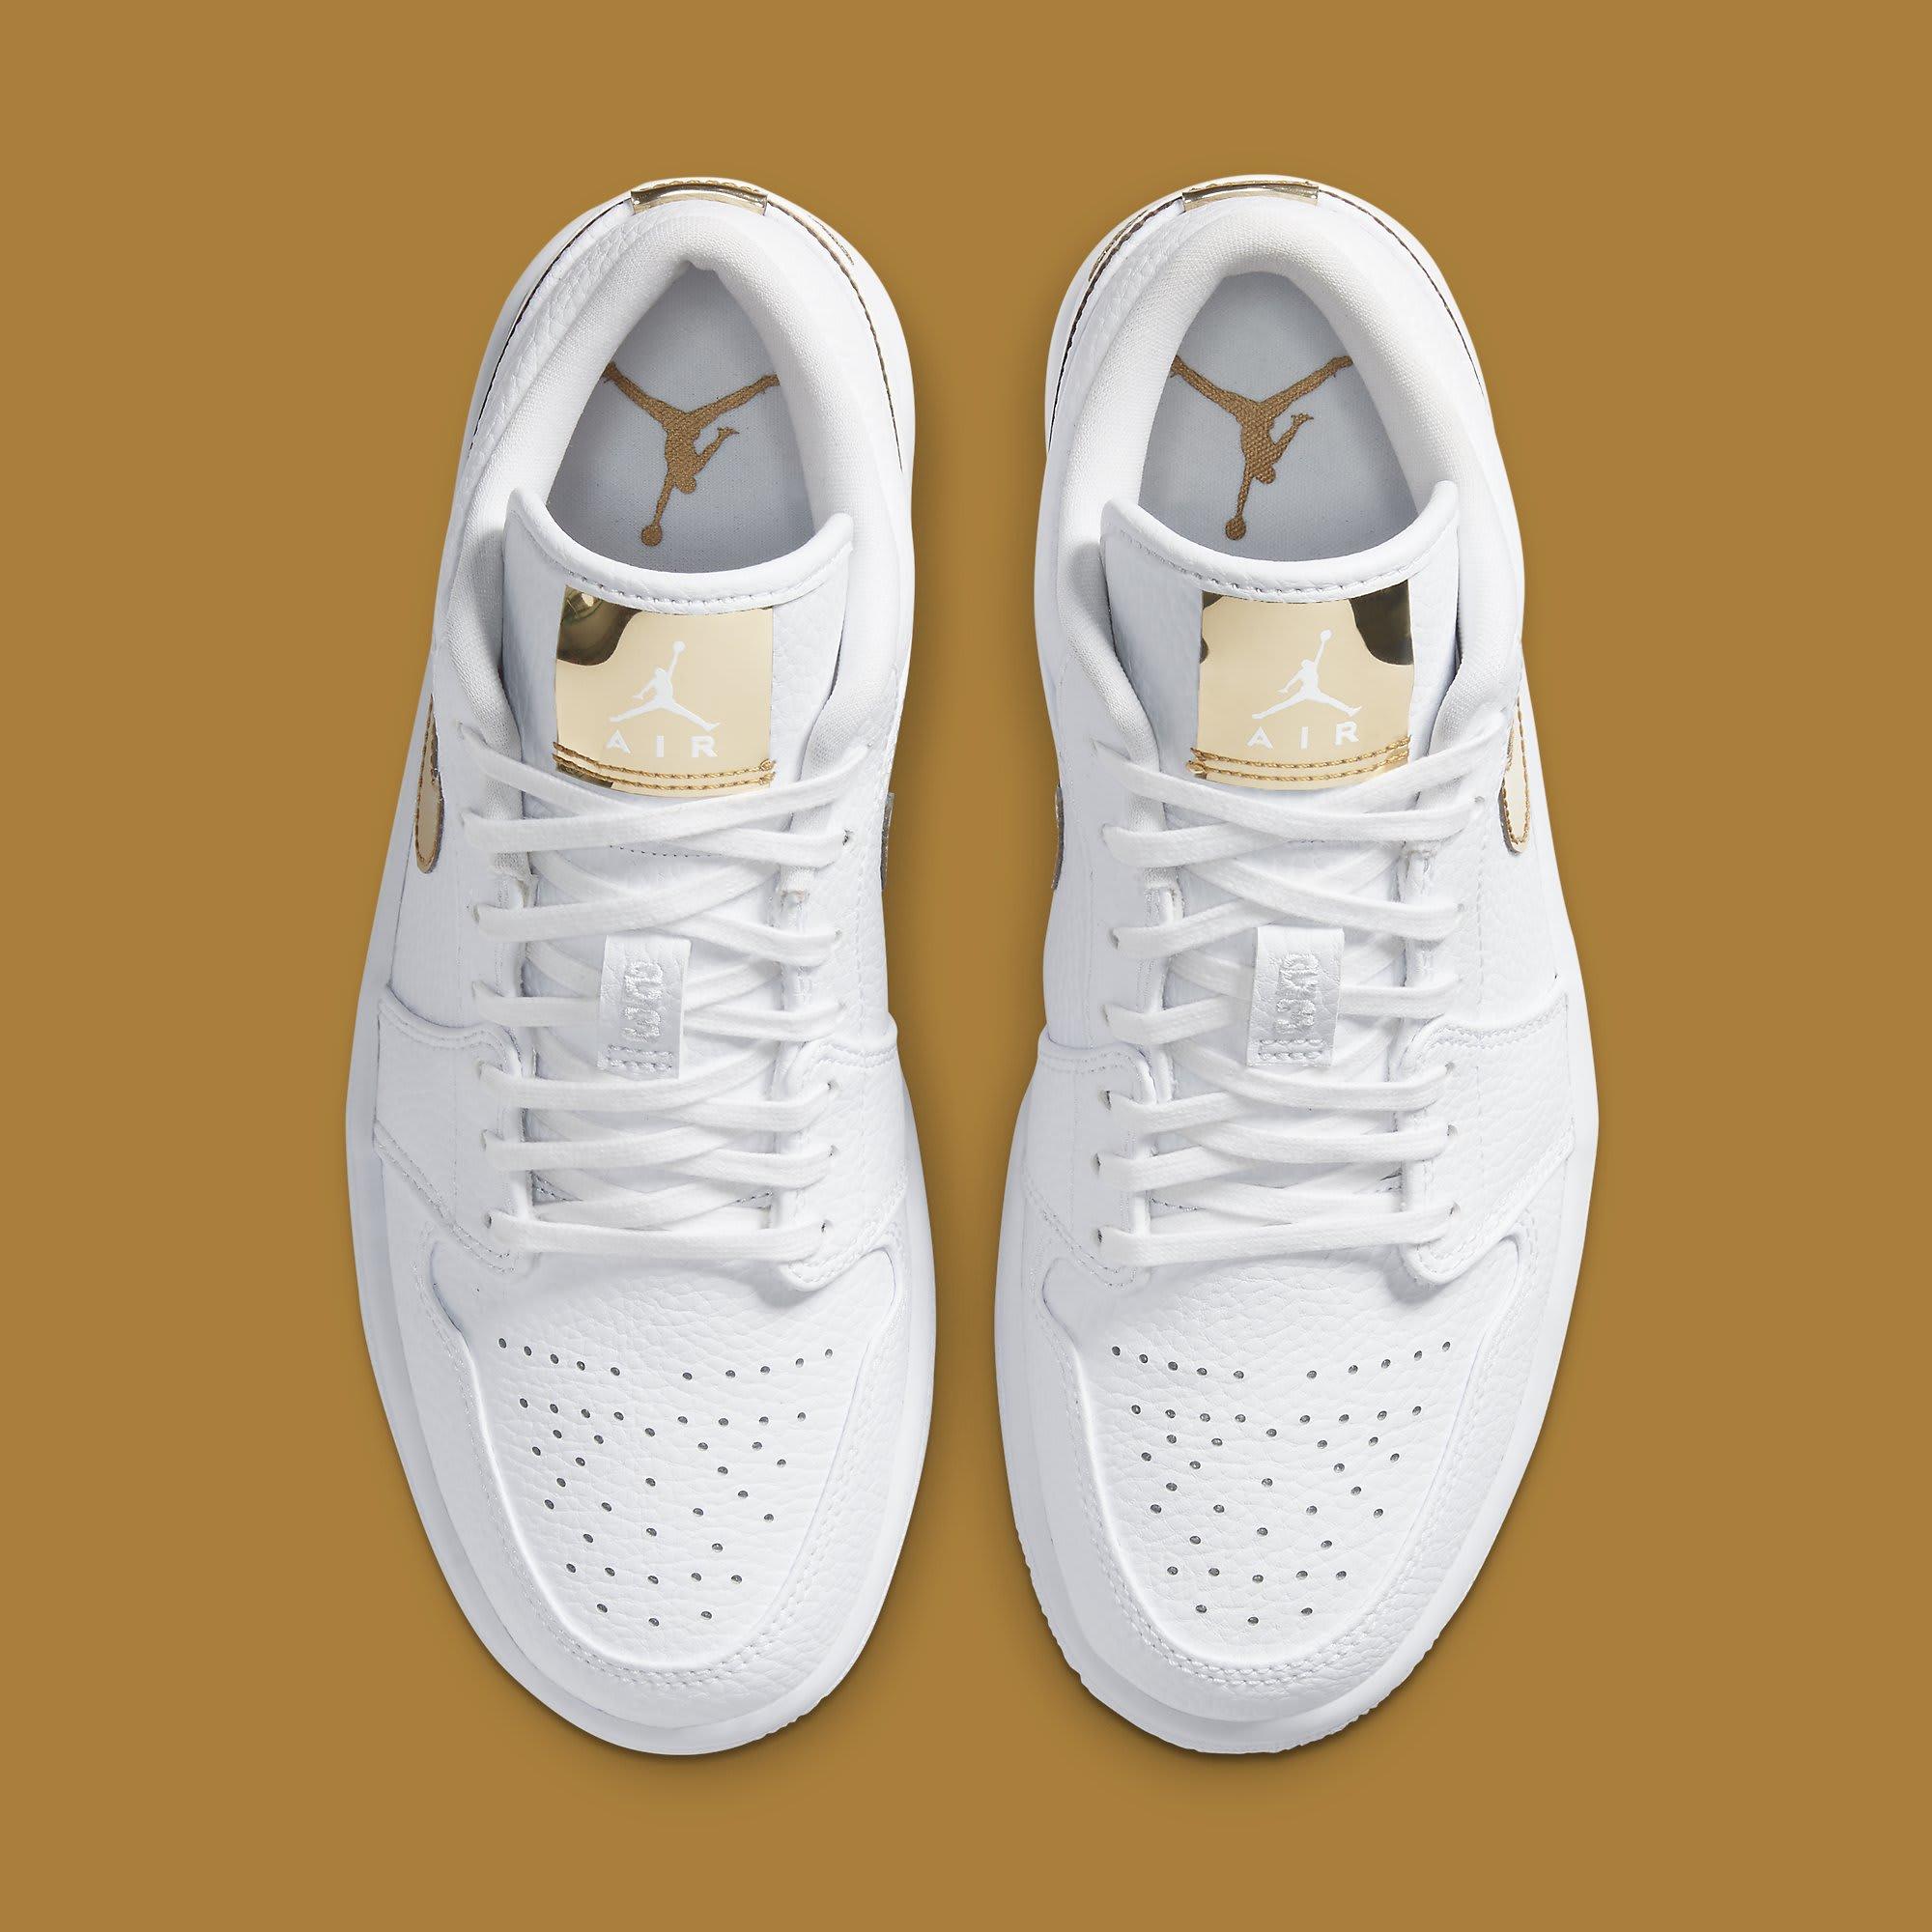 Air Jordan 1 Low White Metallic Gold Release Date CZ4776-100 ...